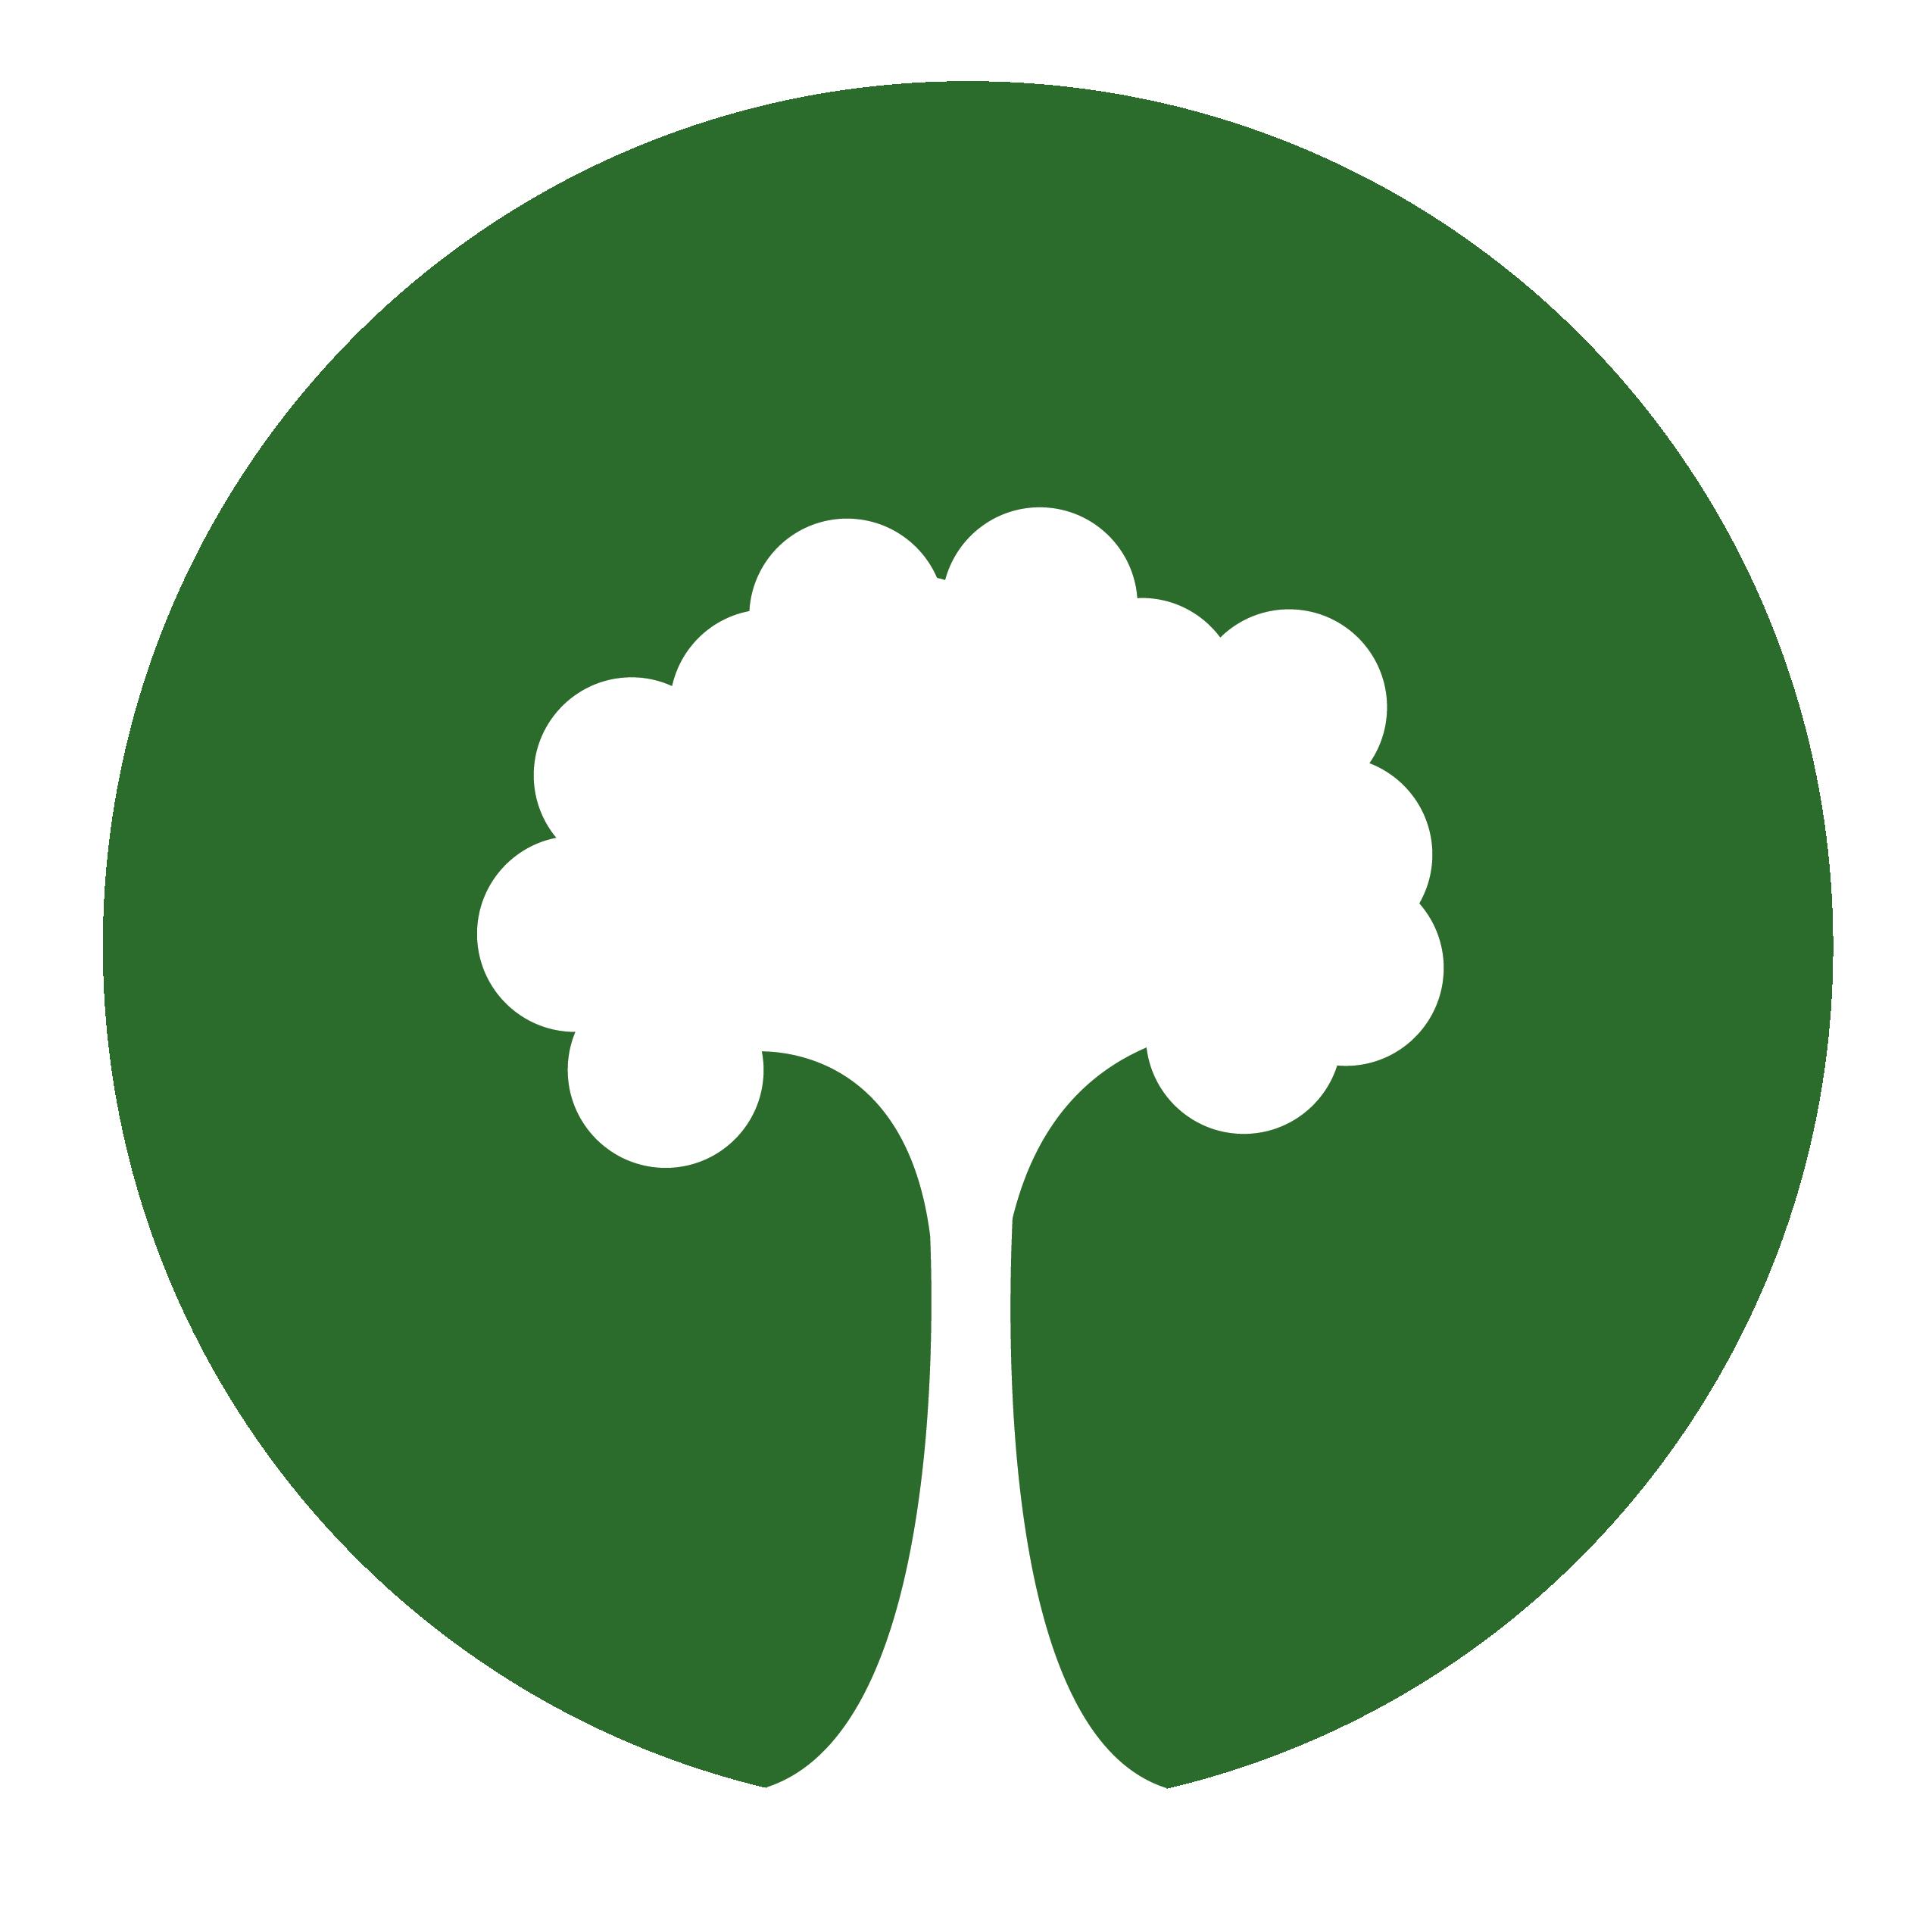 Arboriculture neo environmental ltd. Environment clipart arbor day